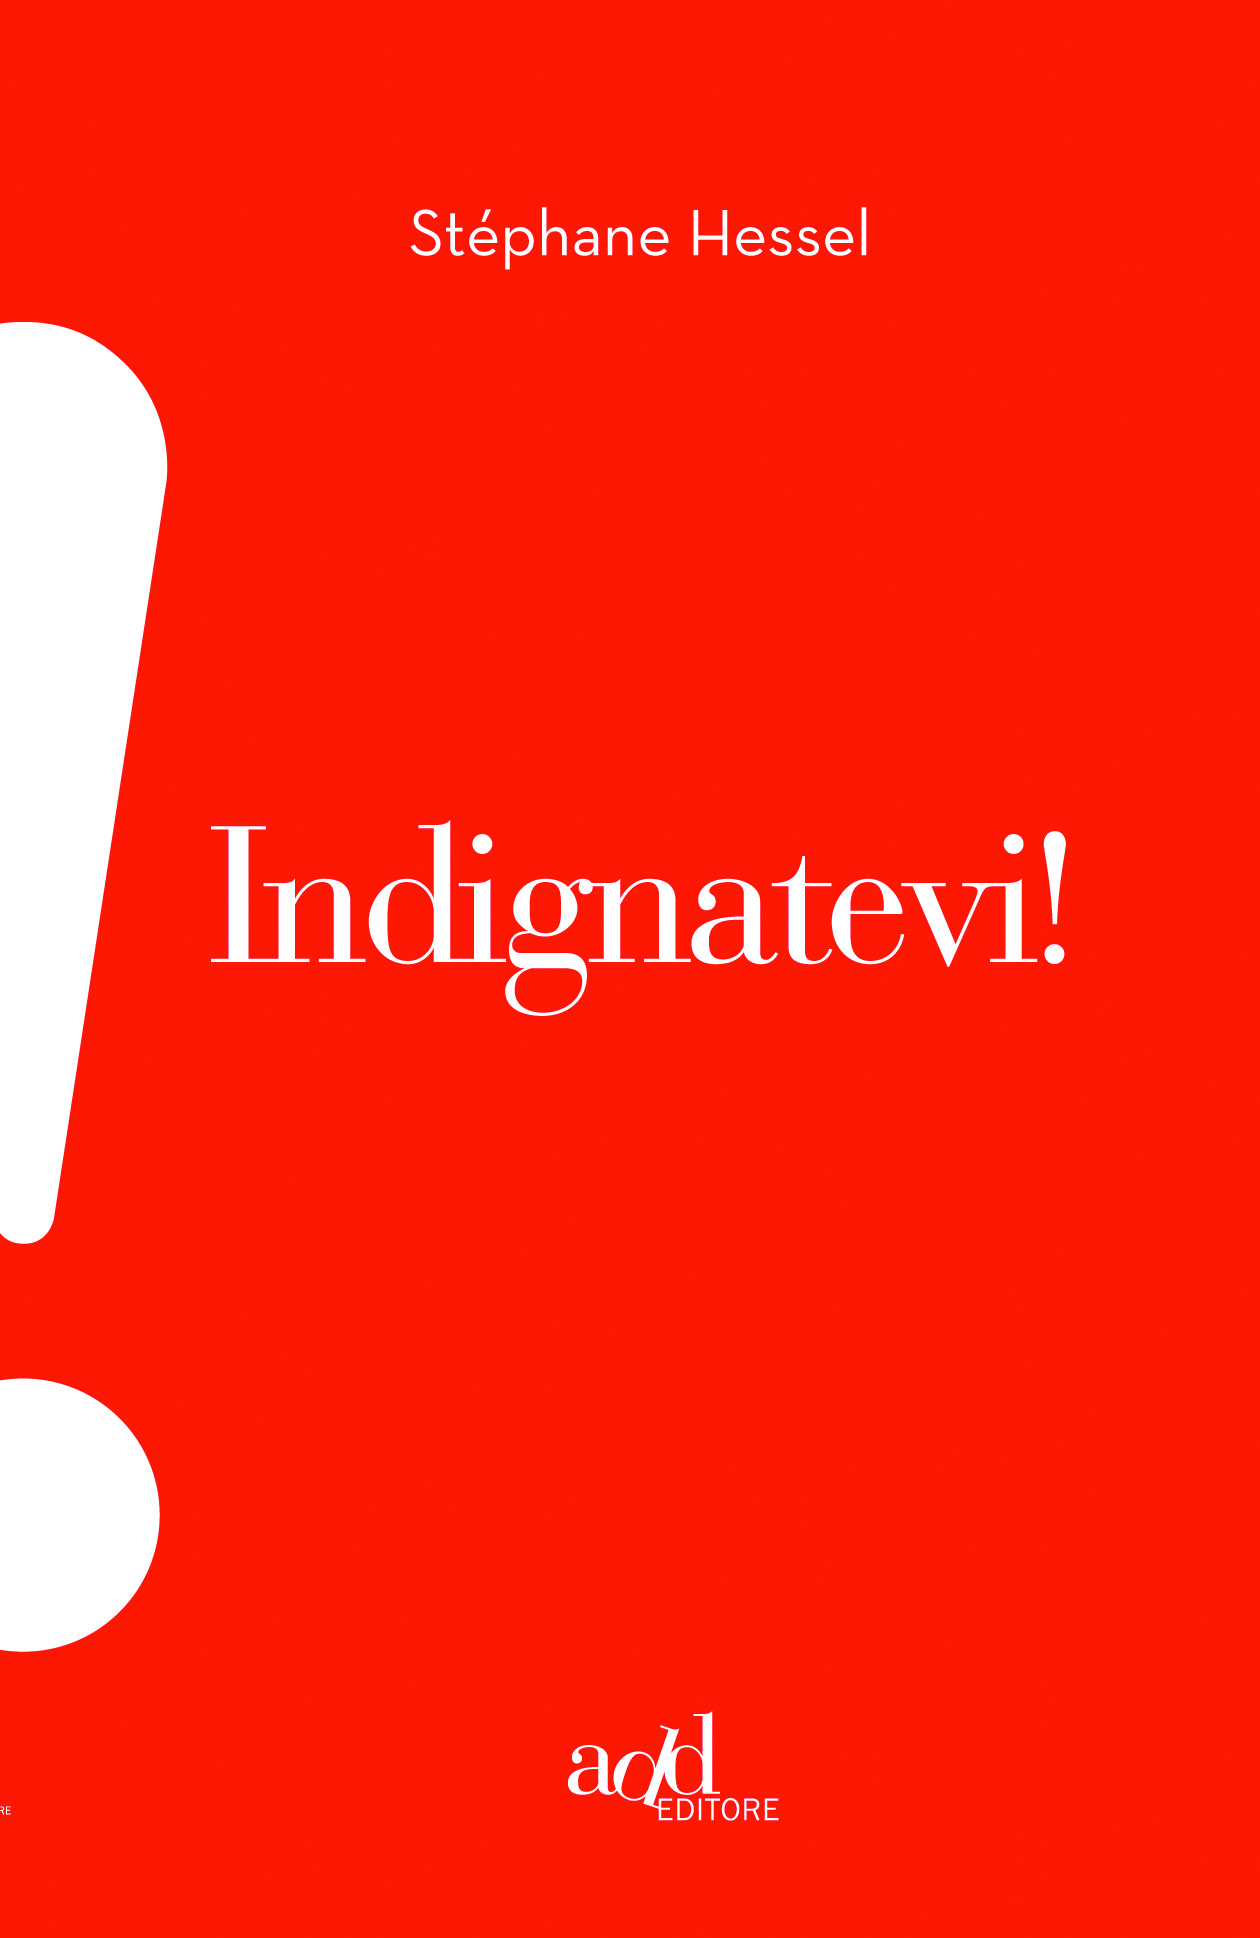 http://www.flaneri.com/fileblog/indignatevi_2.jpg